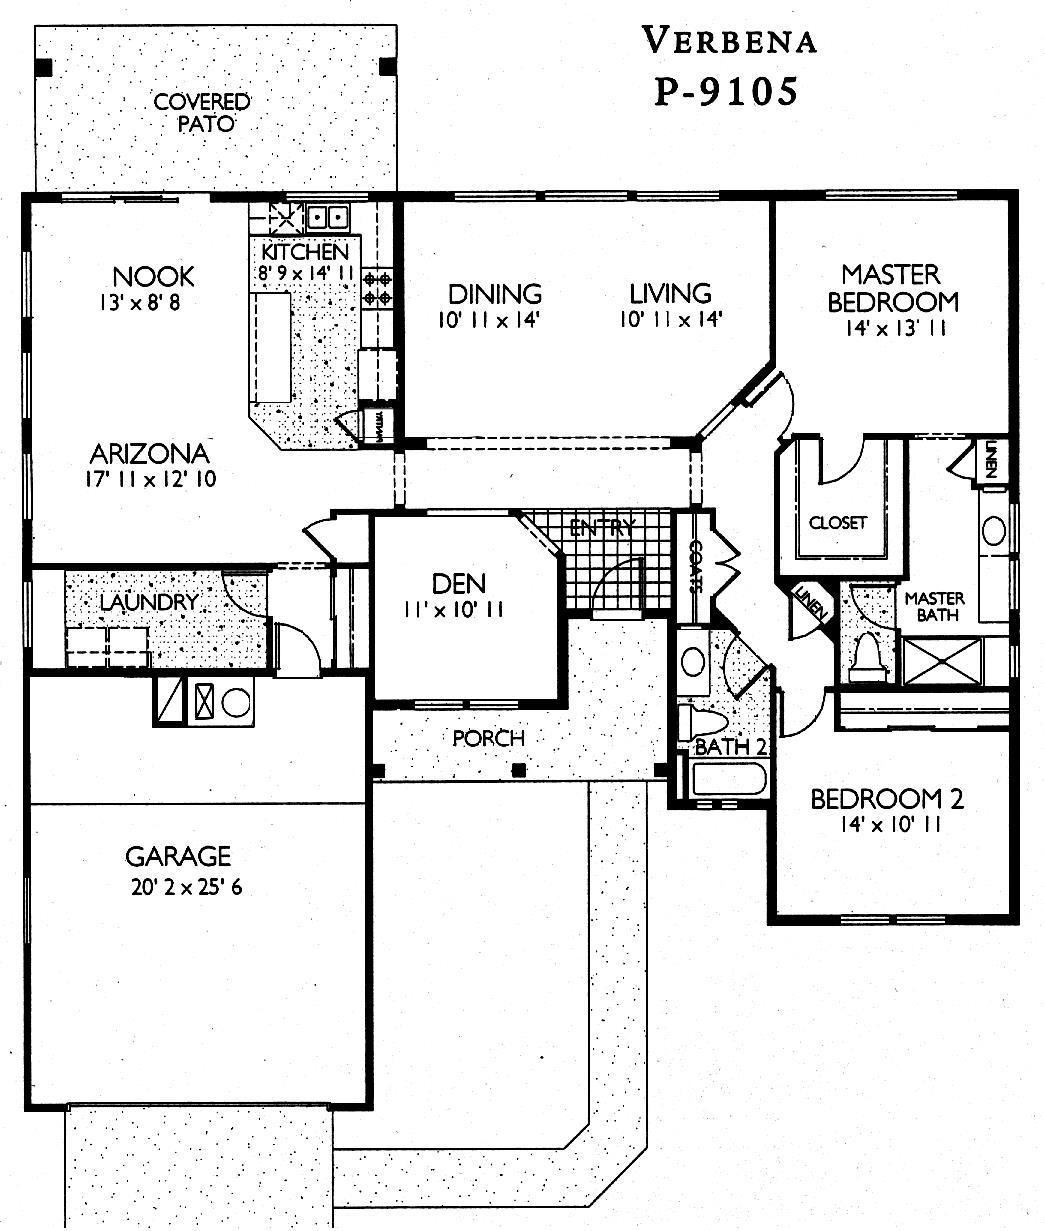 Sun City Grand Verbena Floor Plan Del Webb Sun City Grand